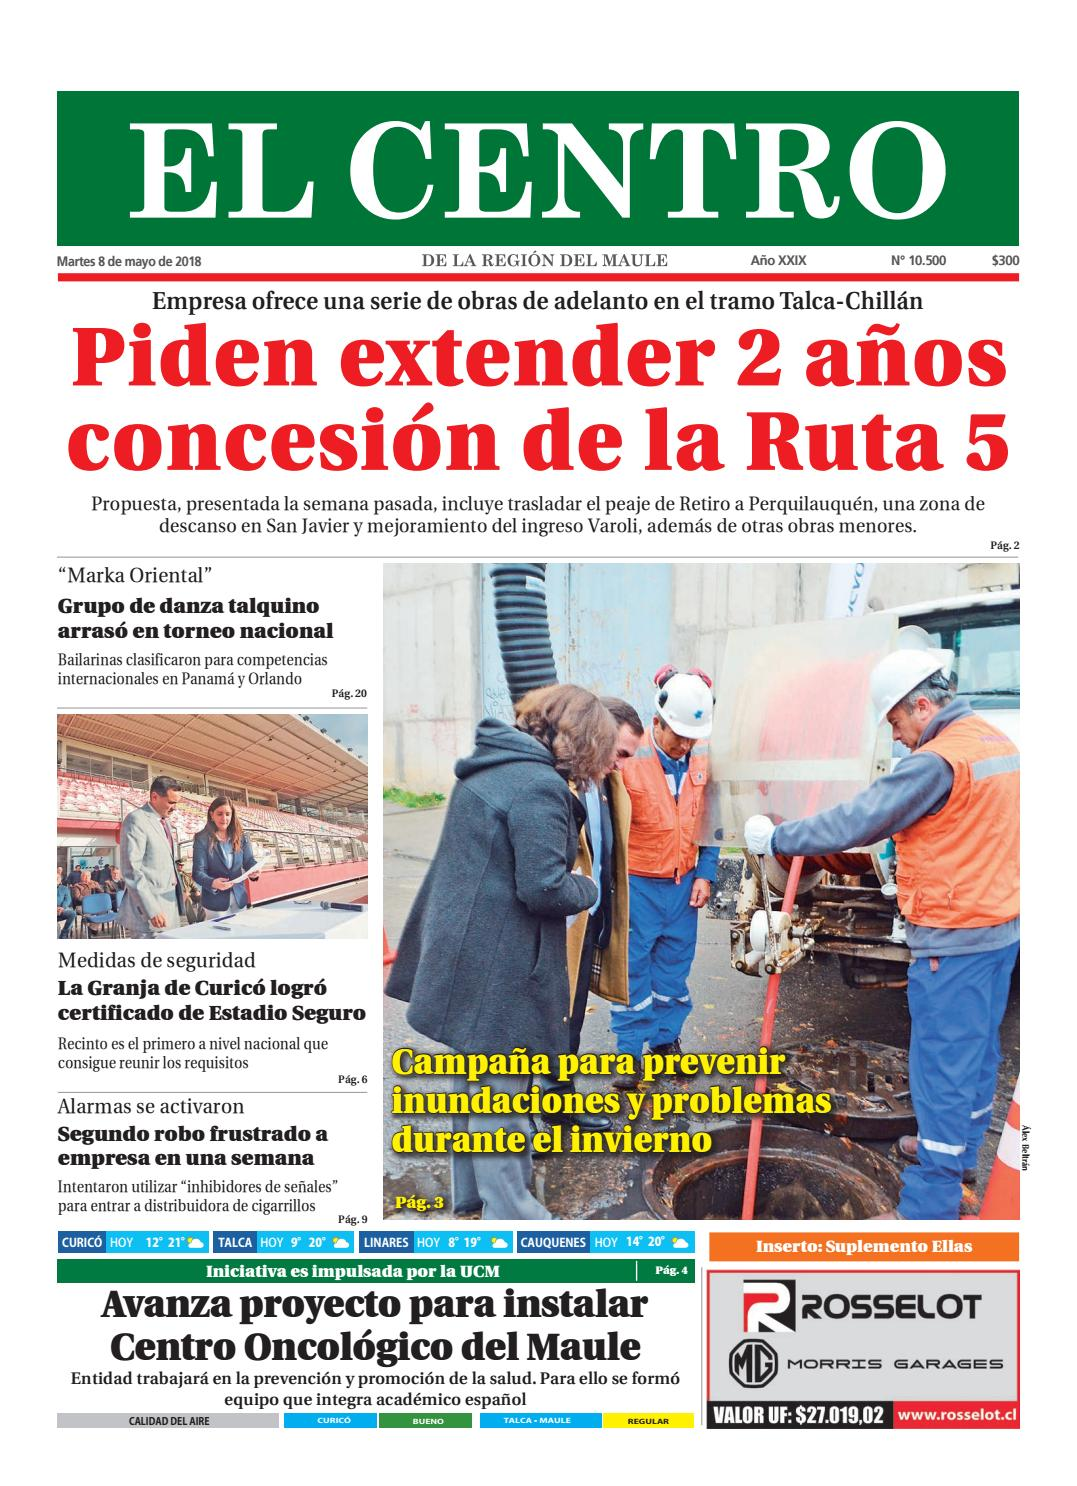 db50fe8fd Diario 08 05 2018 by Diario El Centro S.A - issuu